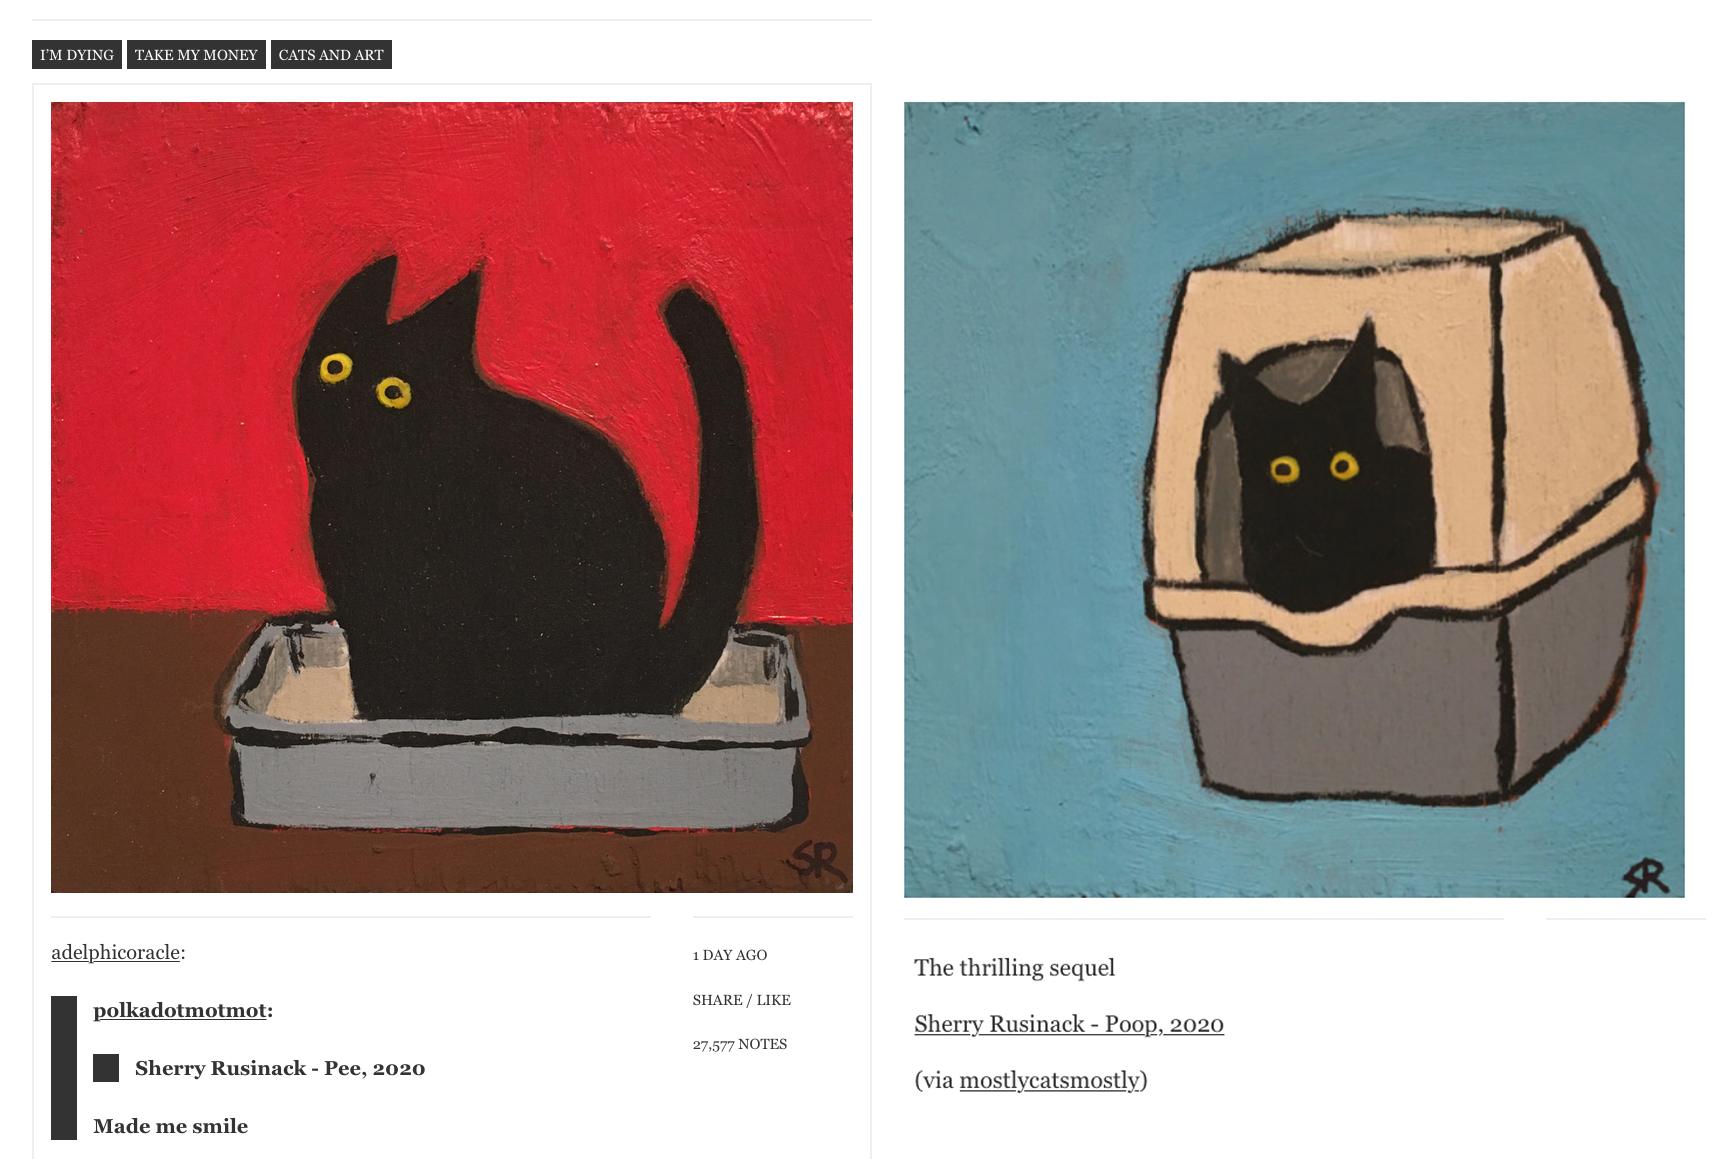 sherryrusinack-mostlycats.jpg